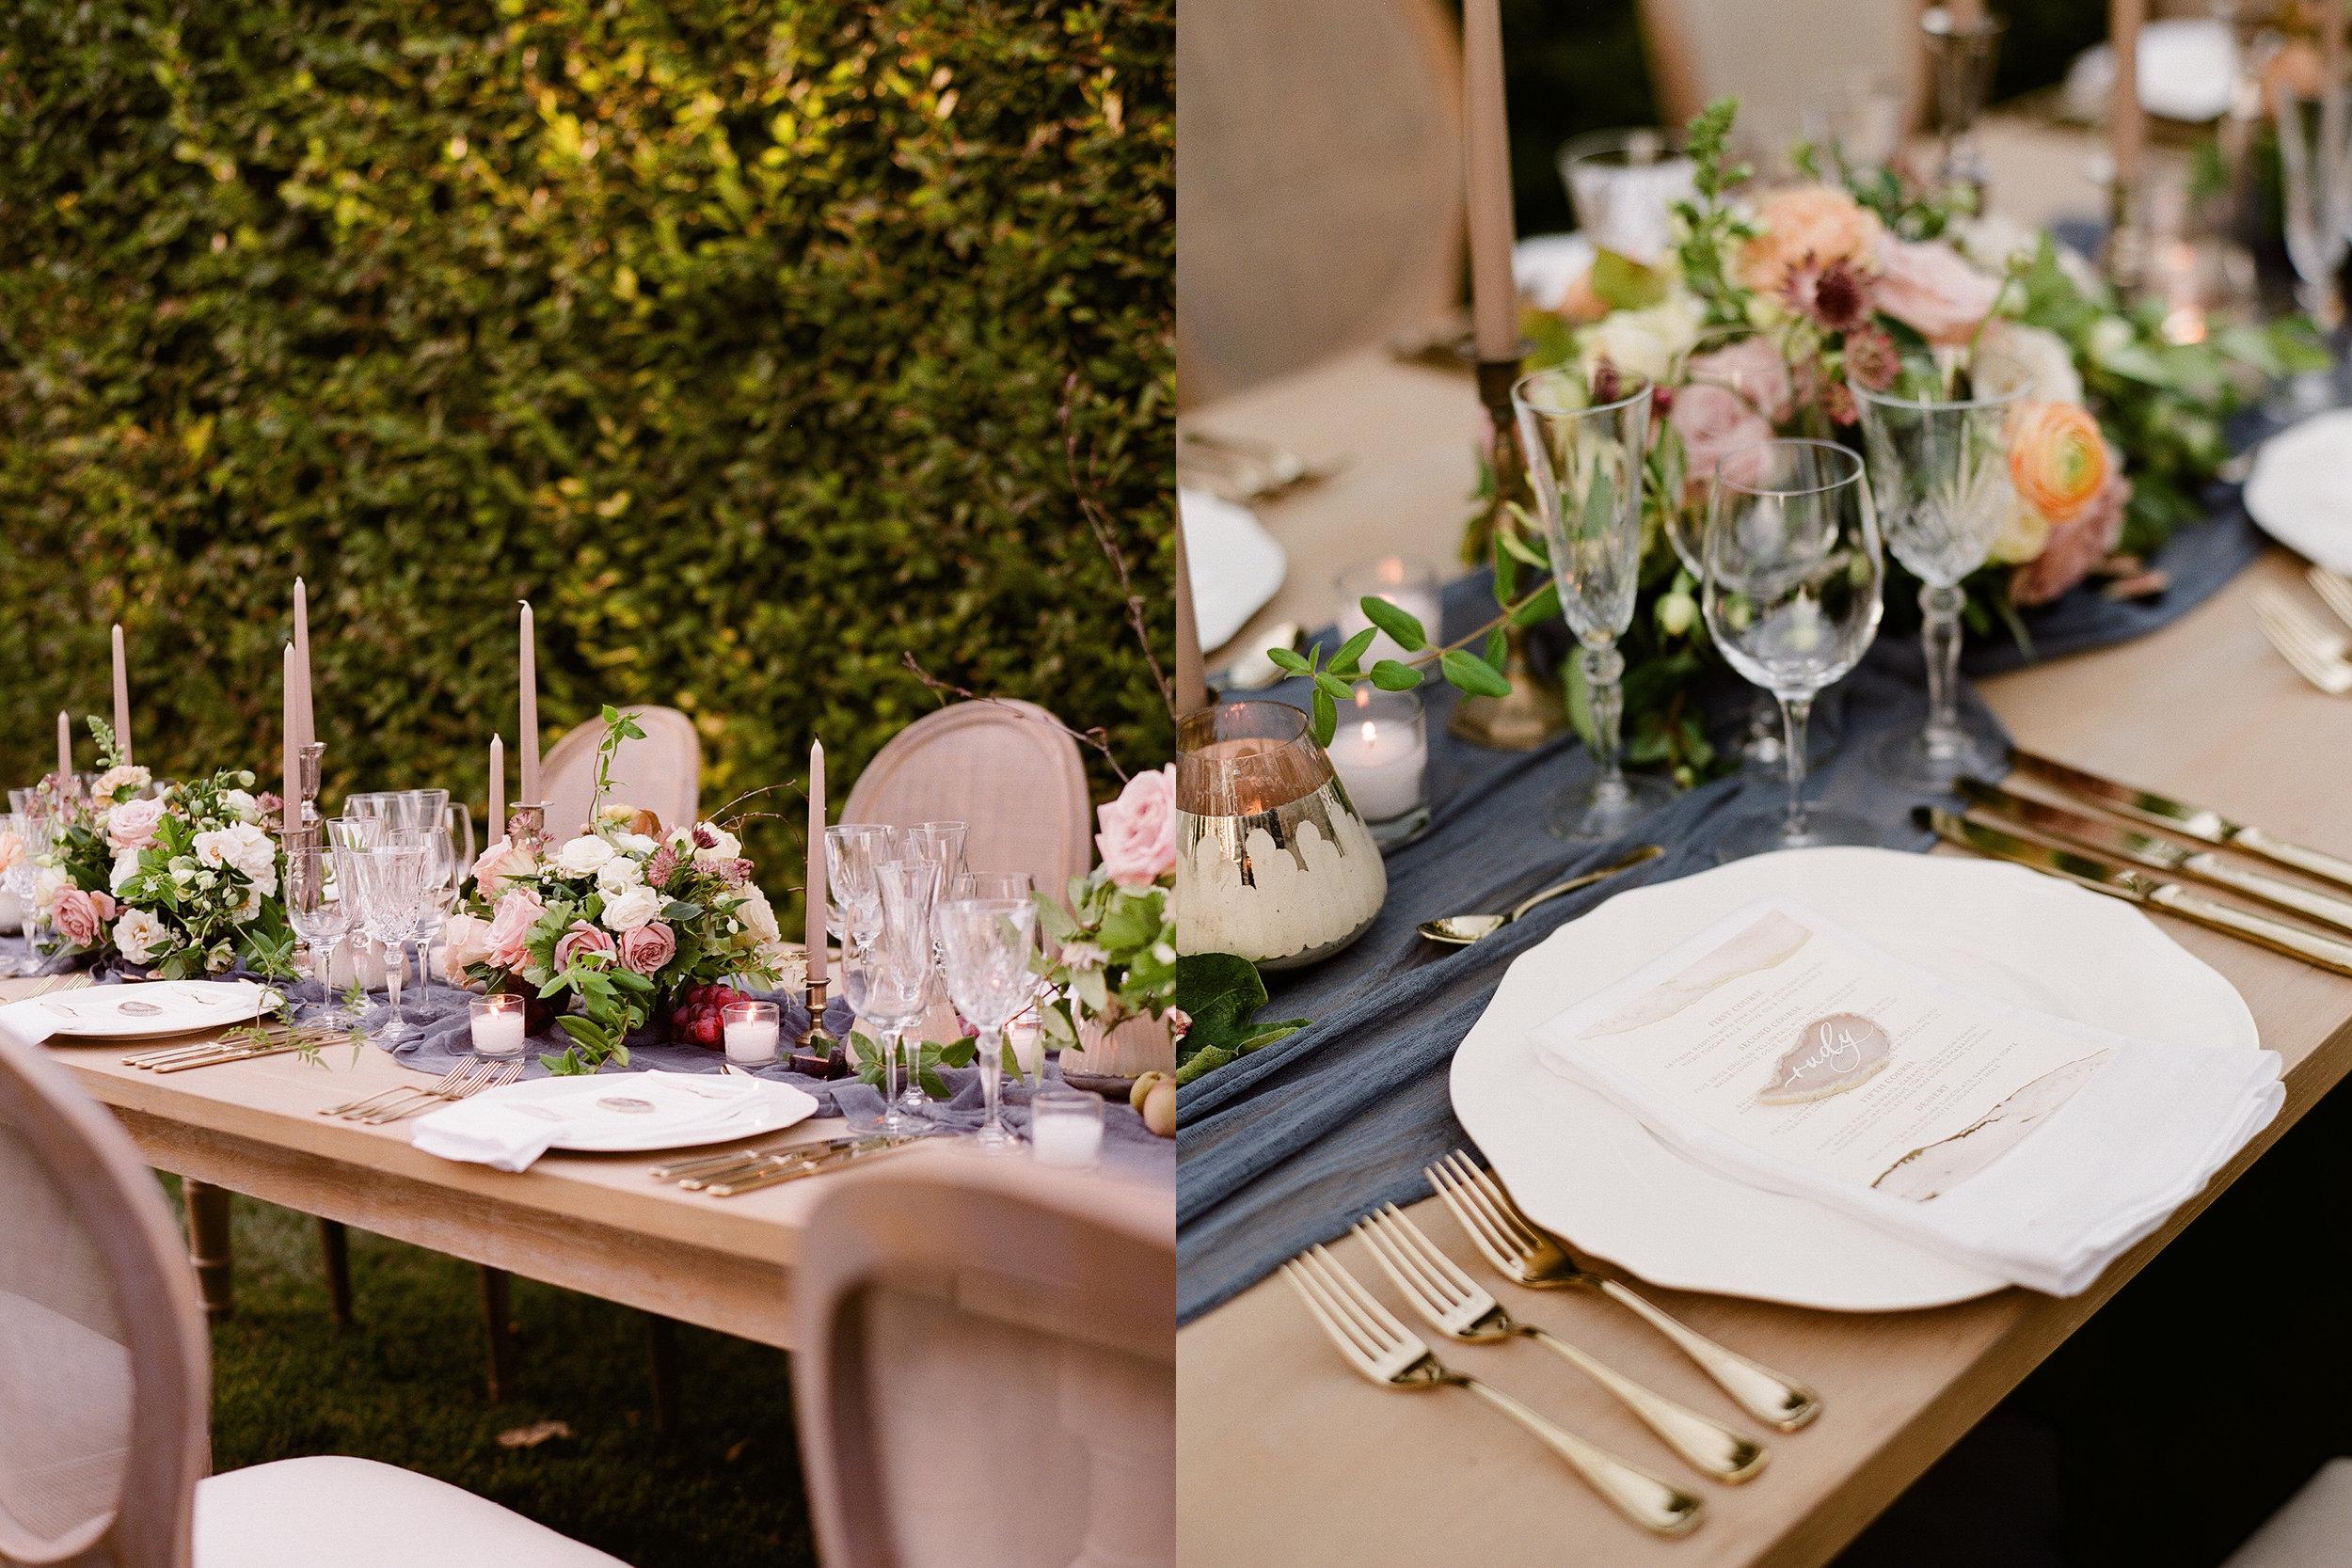 santa-barbara-elopement-elope-wedding-planner-planning-coordinator-day-of-intimate-event-design-kestrel-park-santa-ynez-english-country-estate-garden-castle (23).jpg